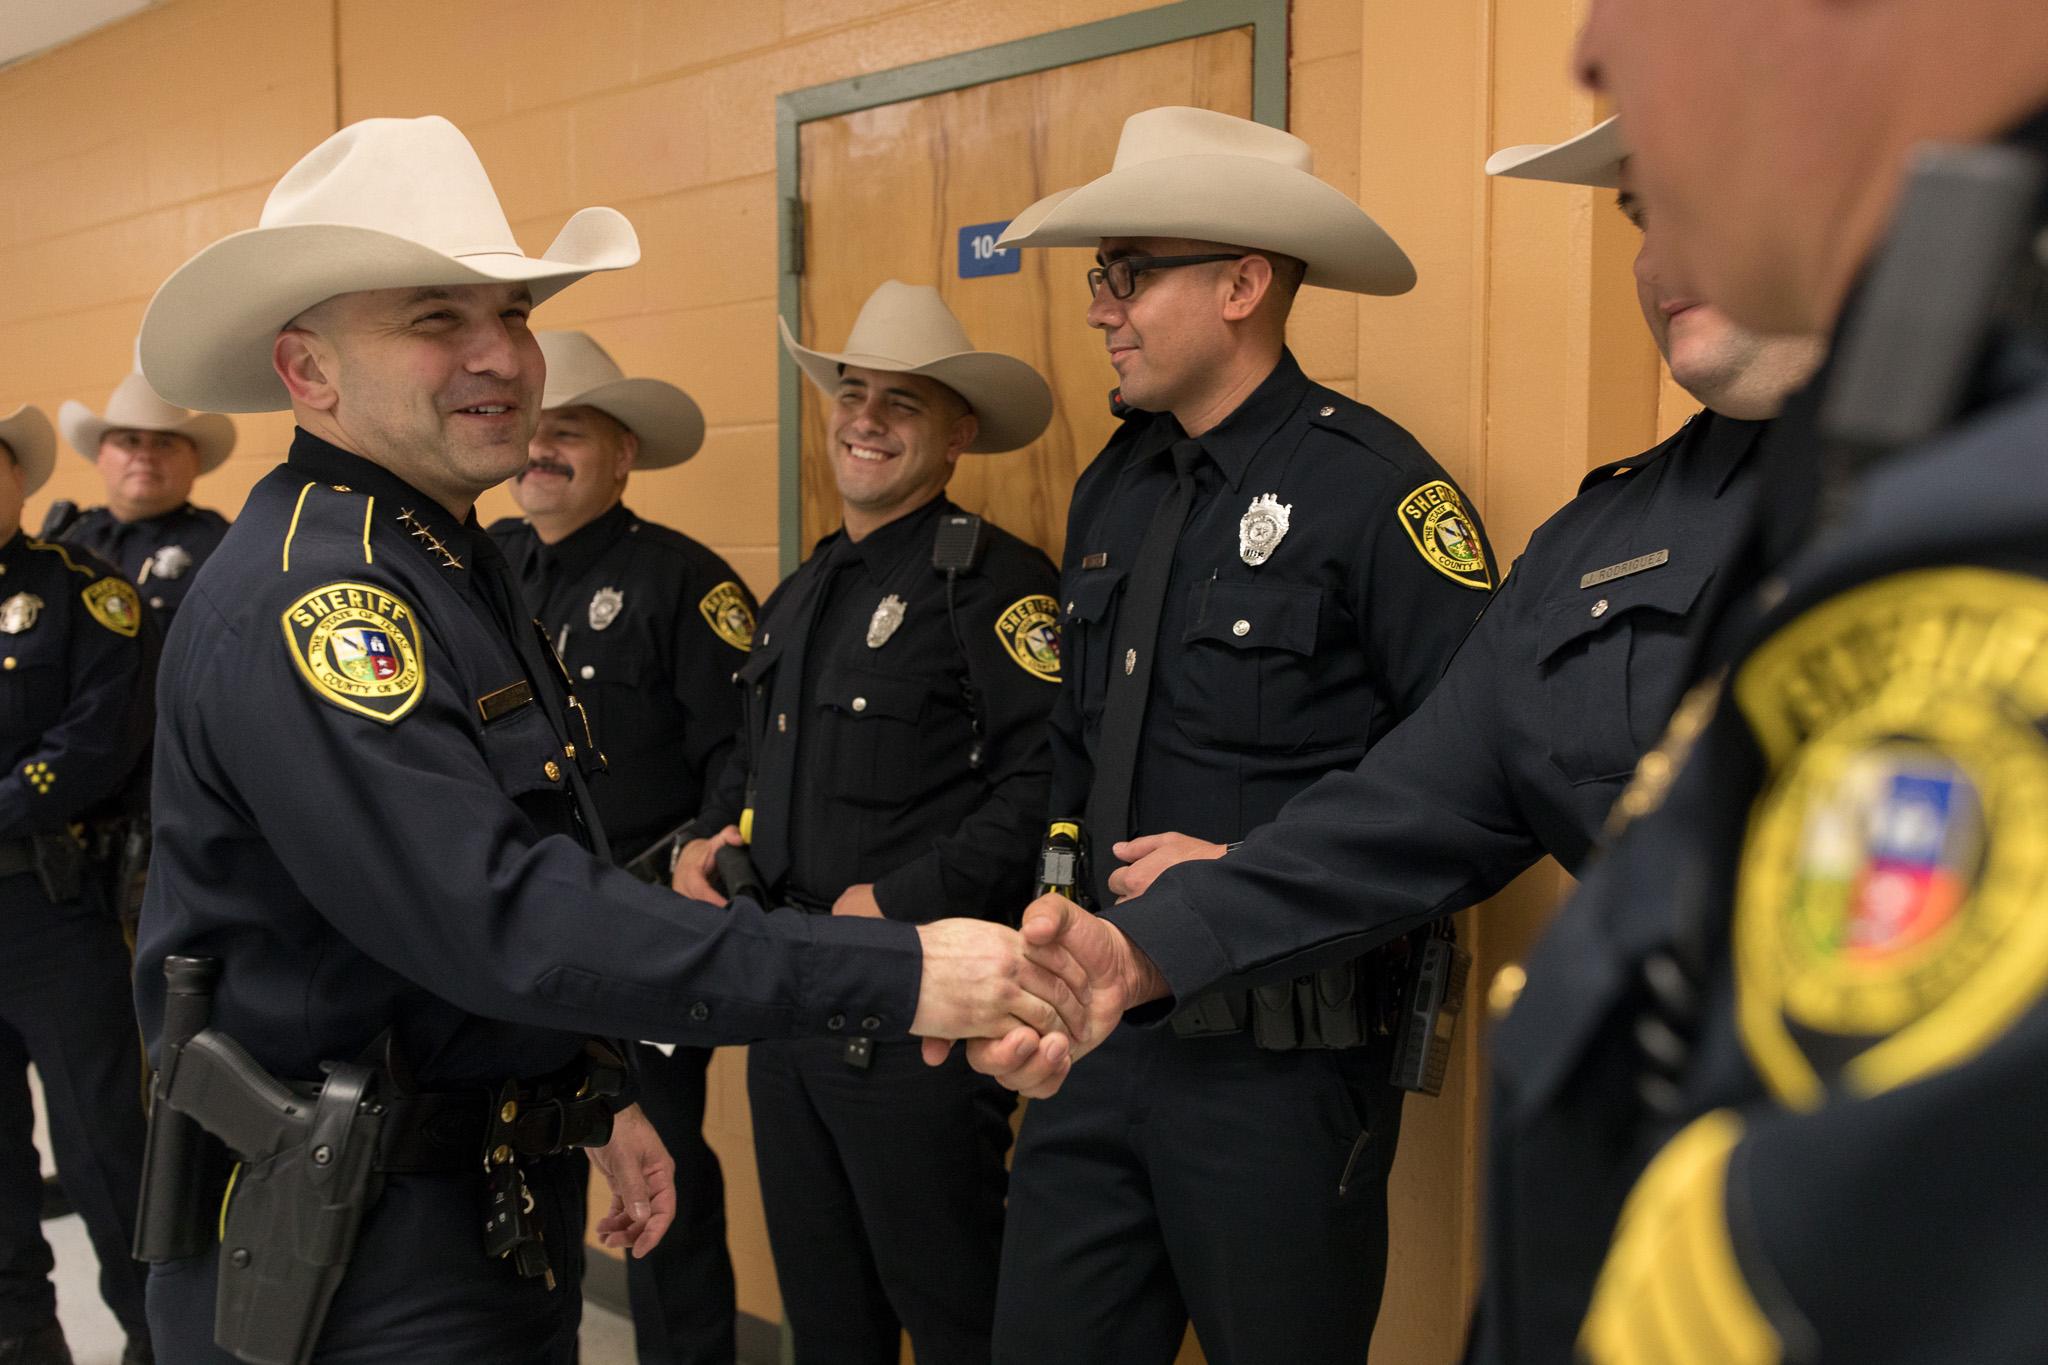 Bexar County Sheriff Javier Salazar shakes the hands of deputies at the Bexar County Sheriff Department Training Academy.